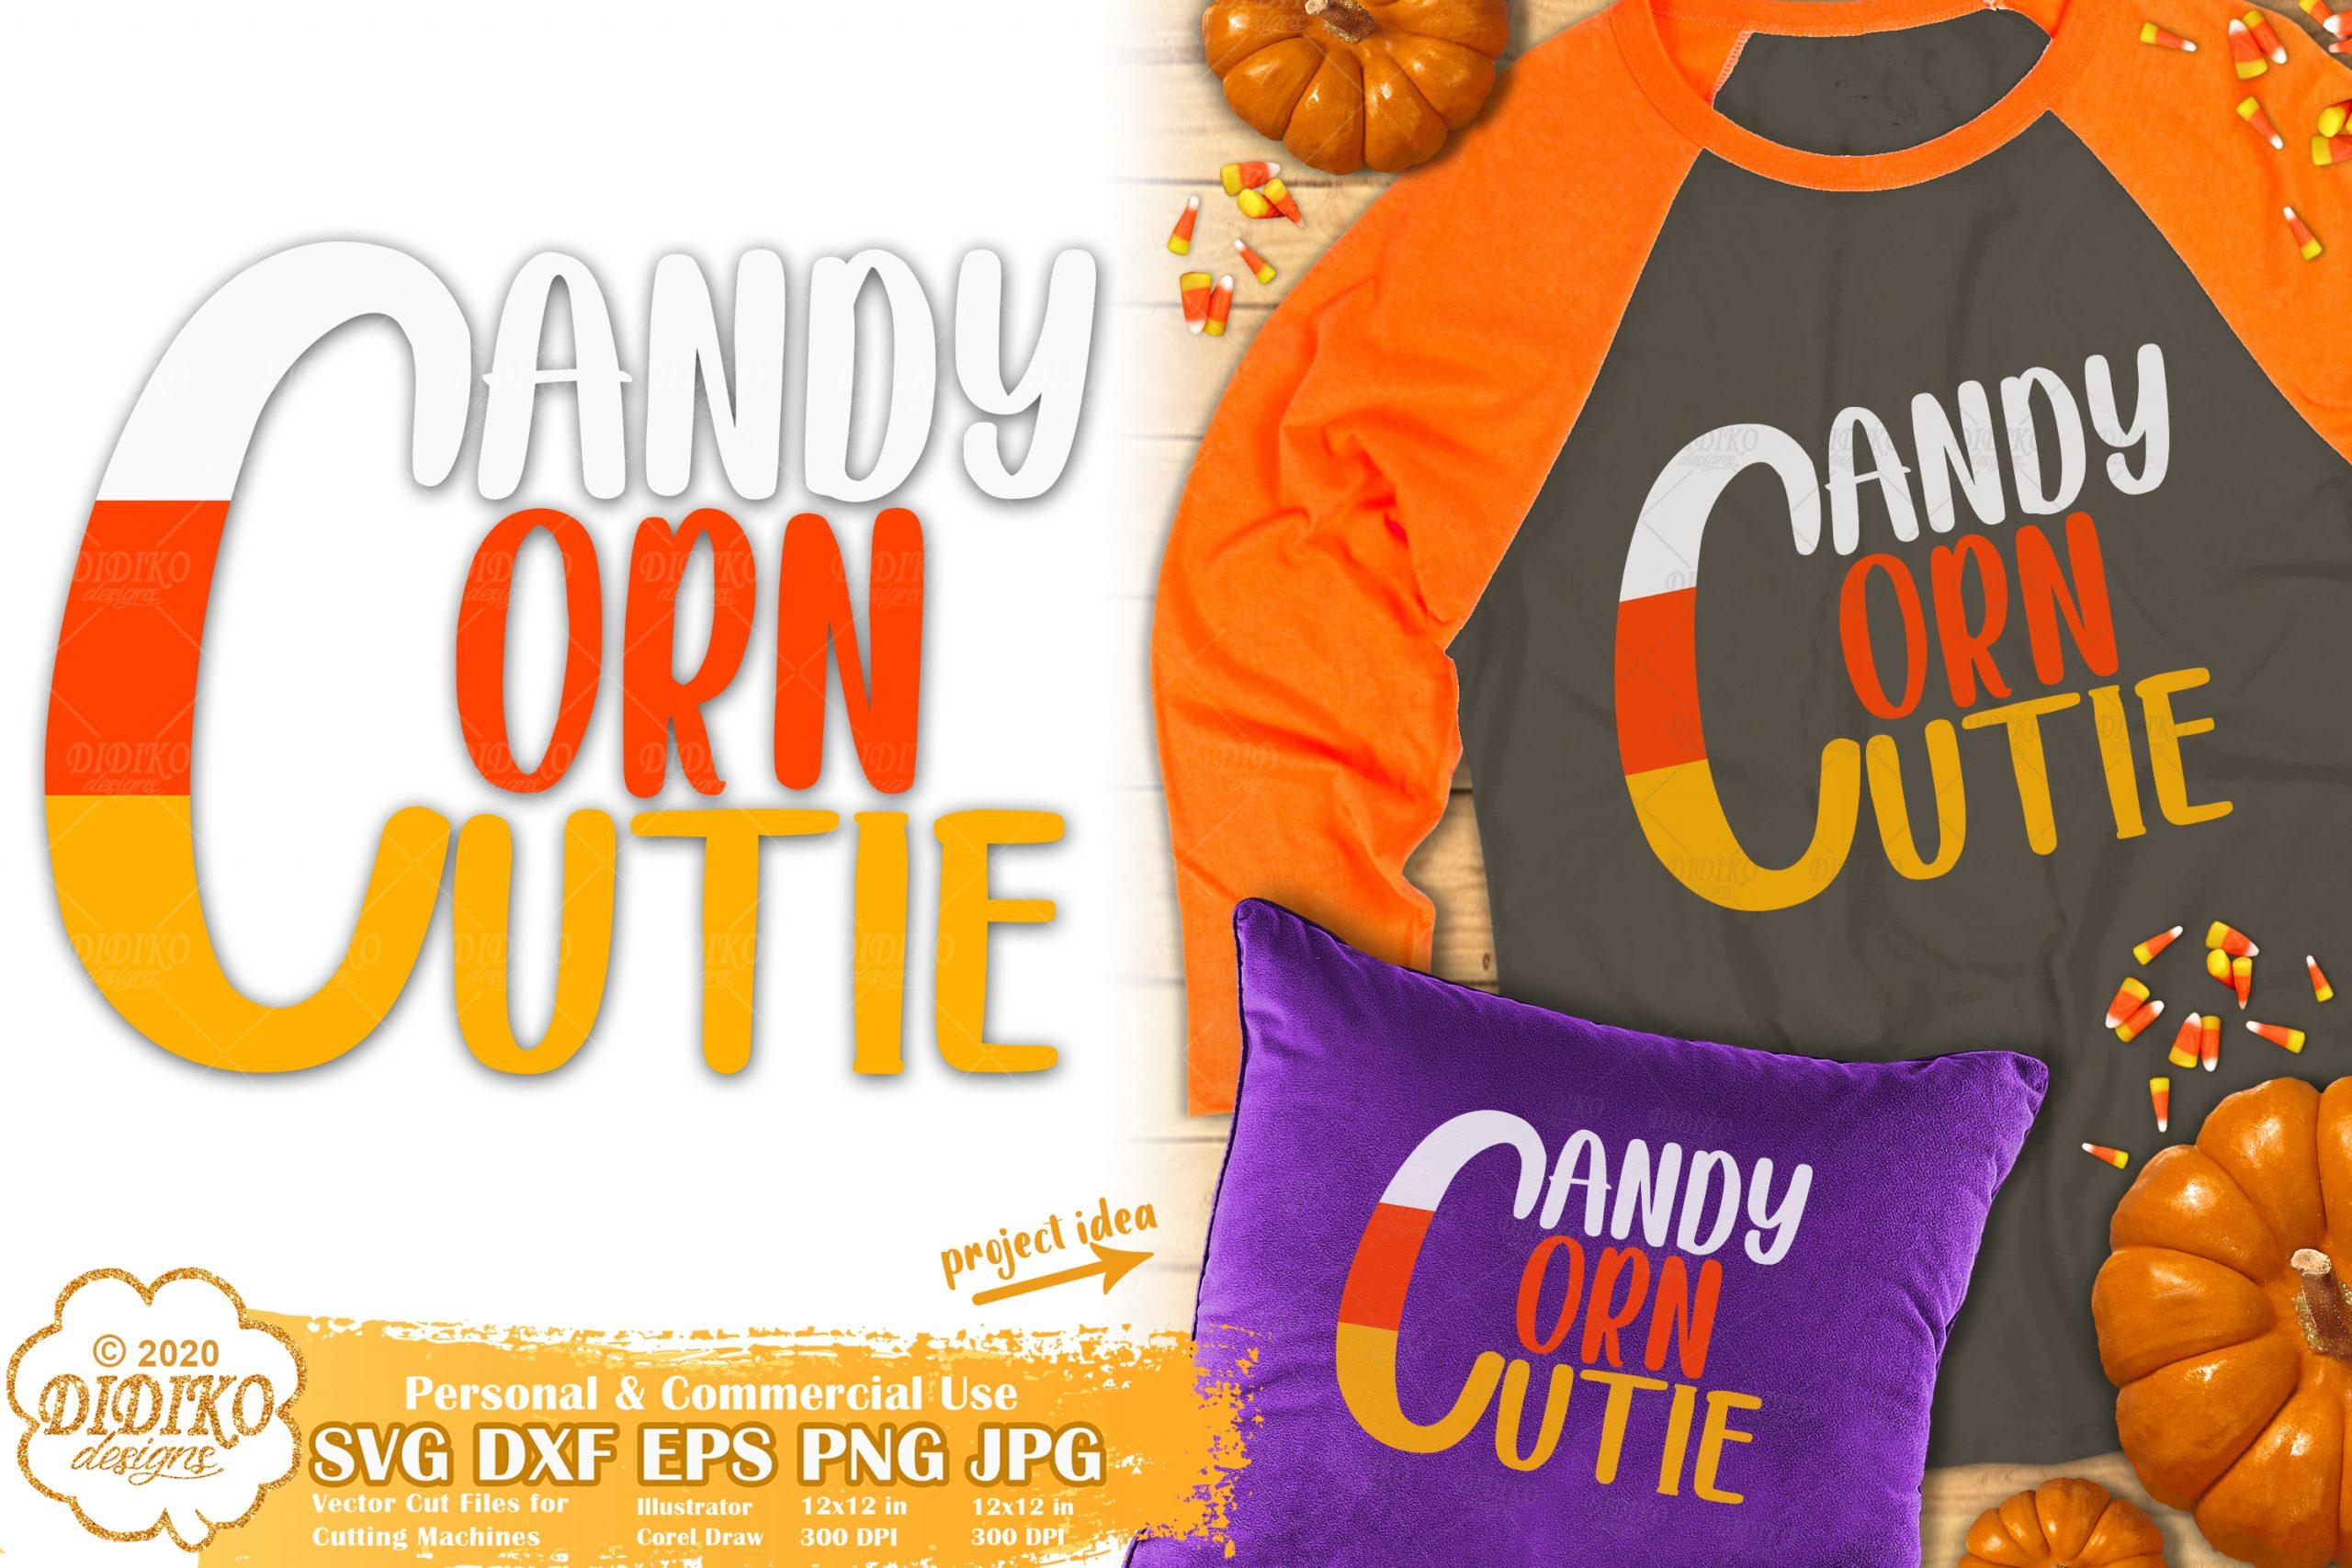 Candy Corn Cutie SVG